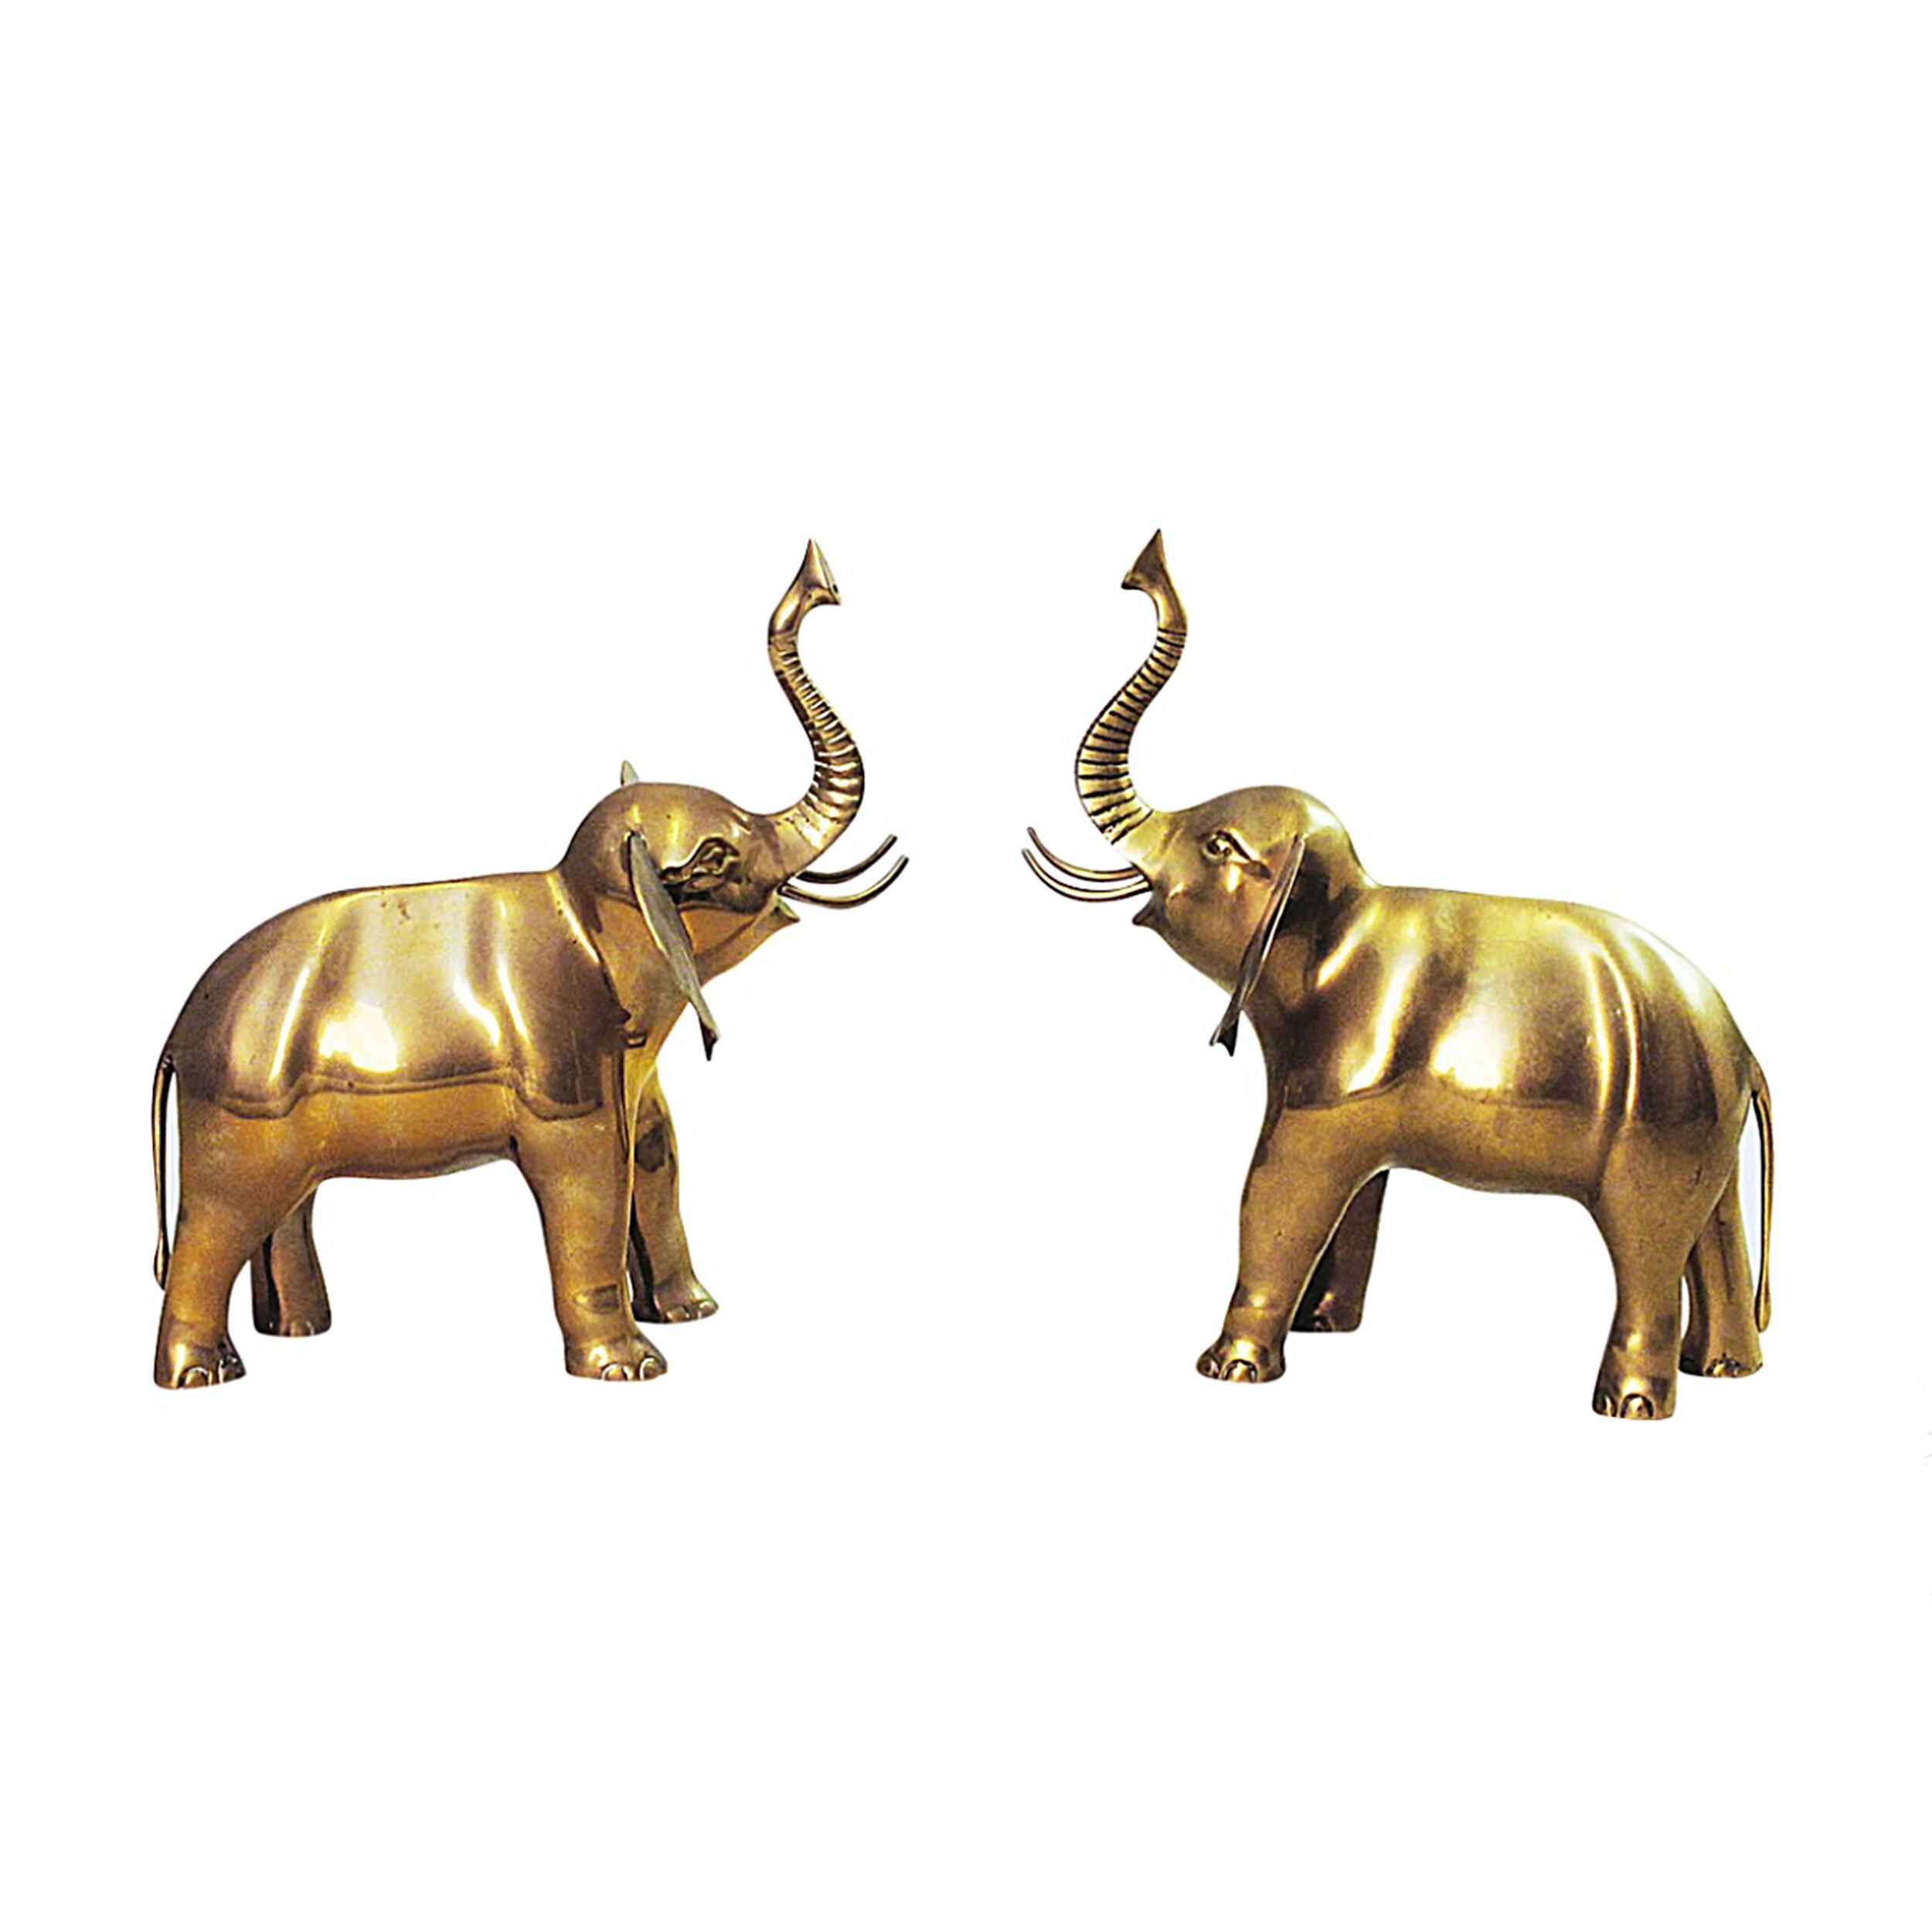 Brass Pair of Vintage Elephants